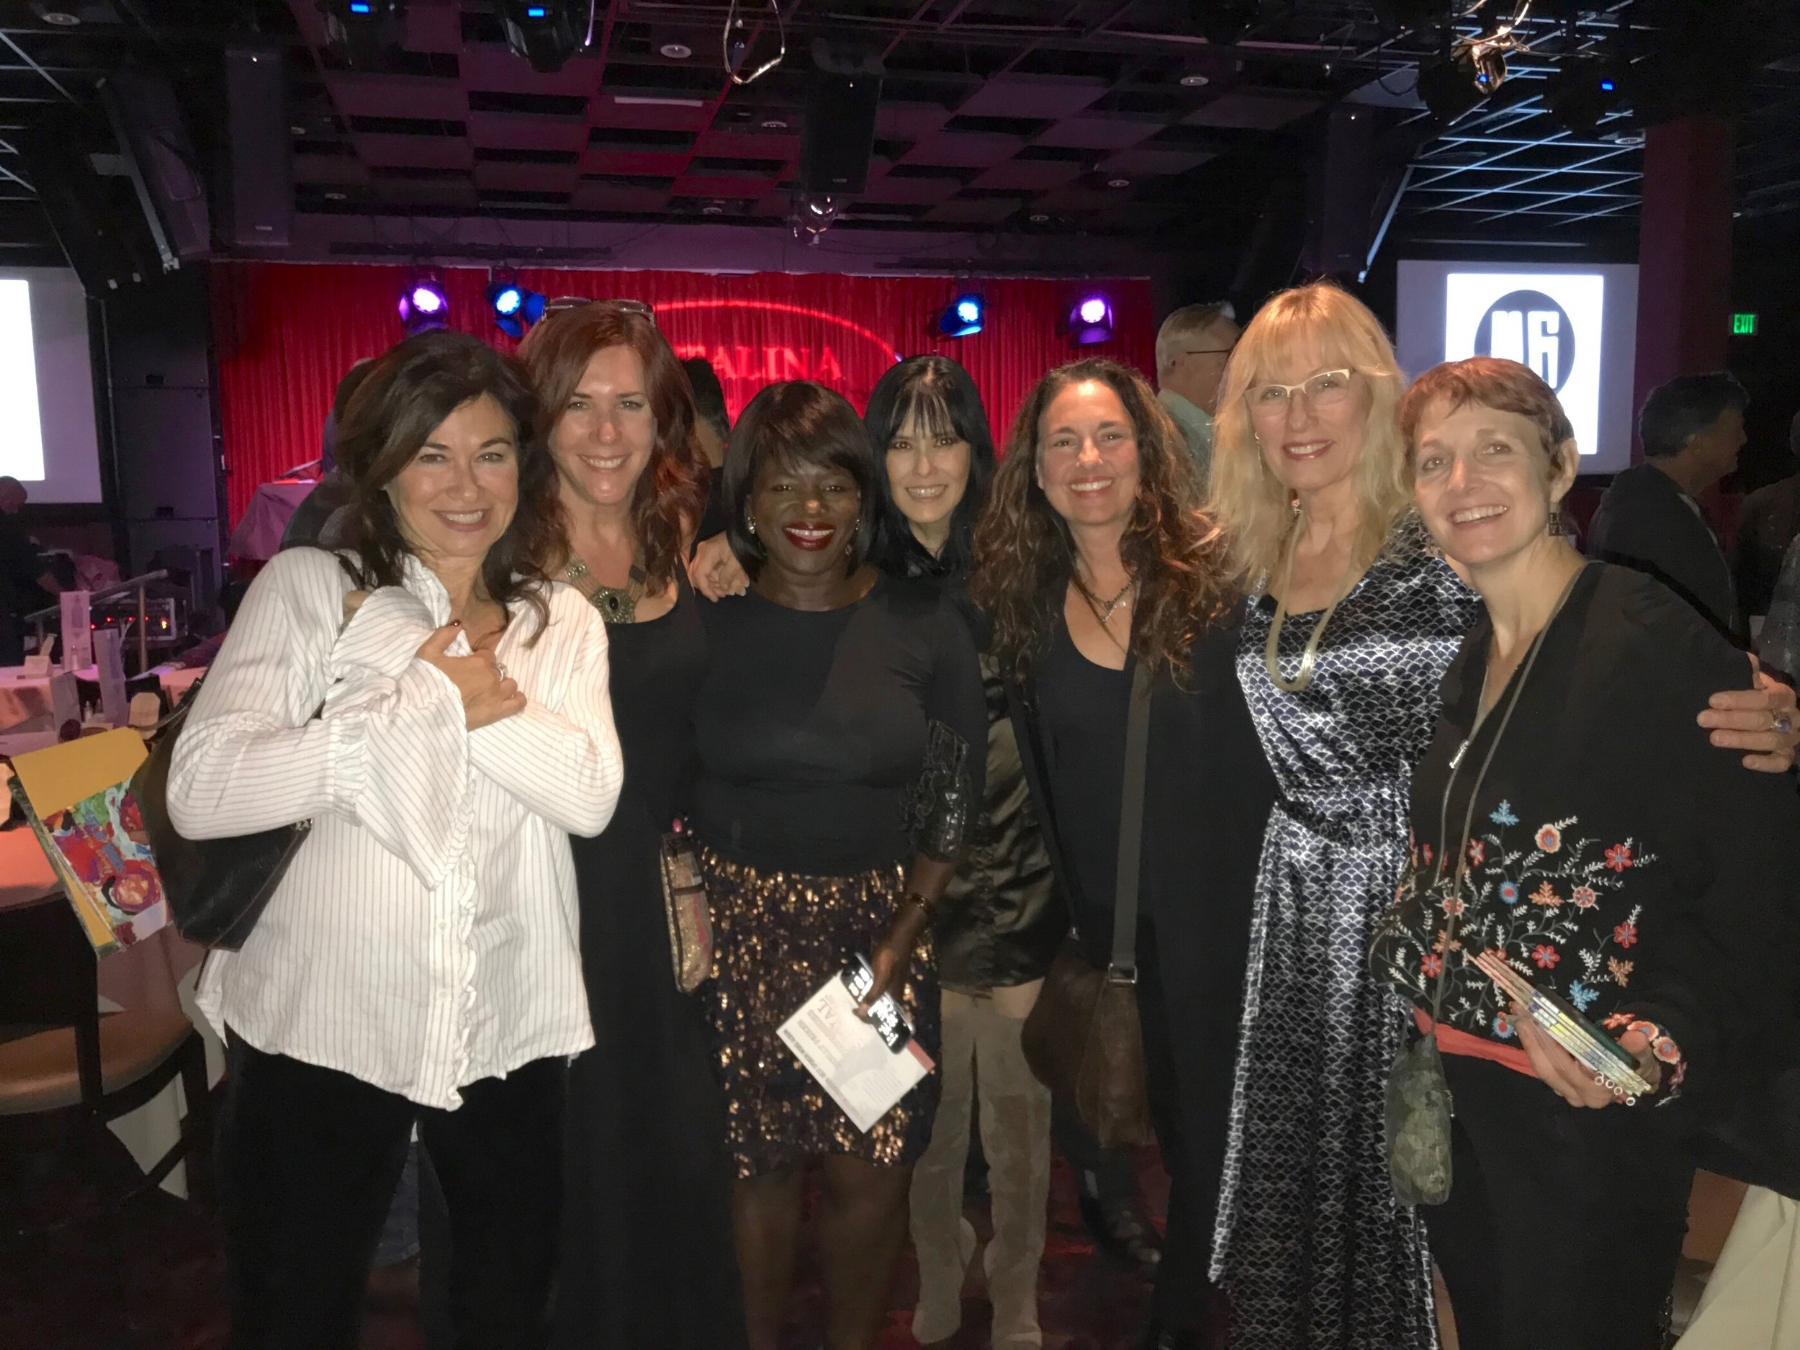 Last night at the Catlina Club w/Amanda Abizaid,Douyé,Diana Dilee Maher, Starr Parodi, Darlene Koldenhoven, Susan Picking